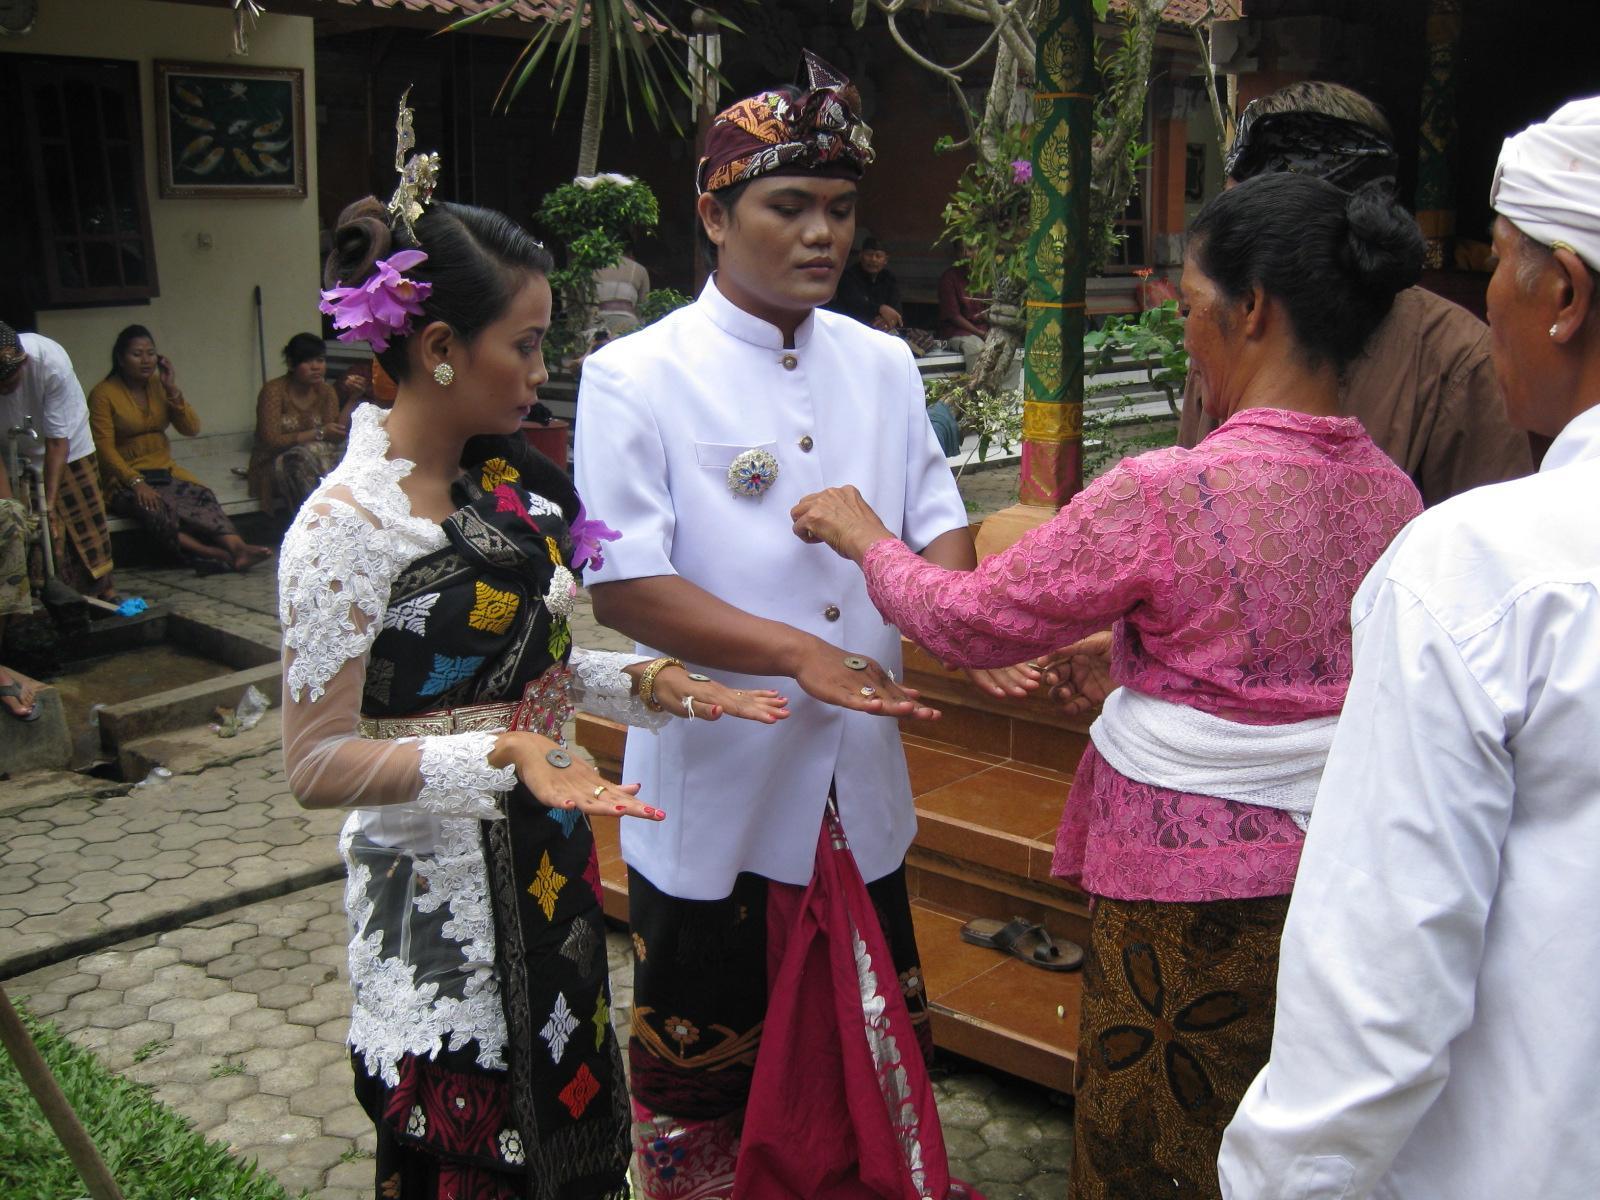 Hindu wedding ceremonies are